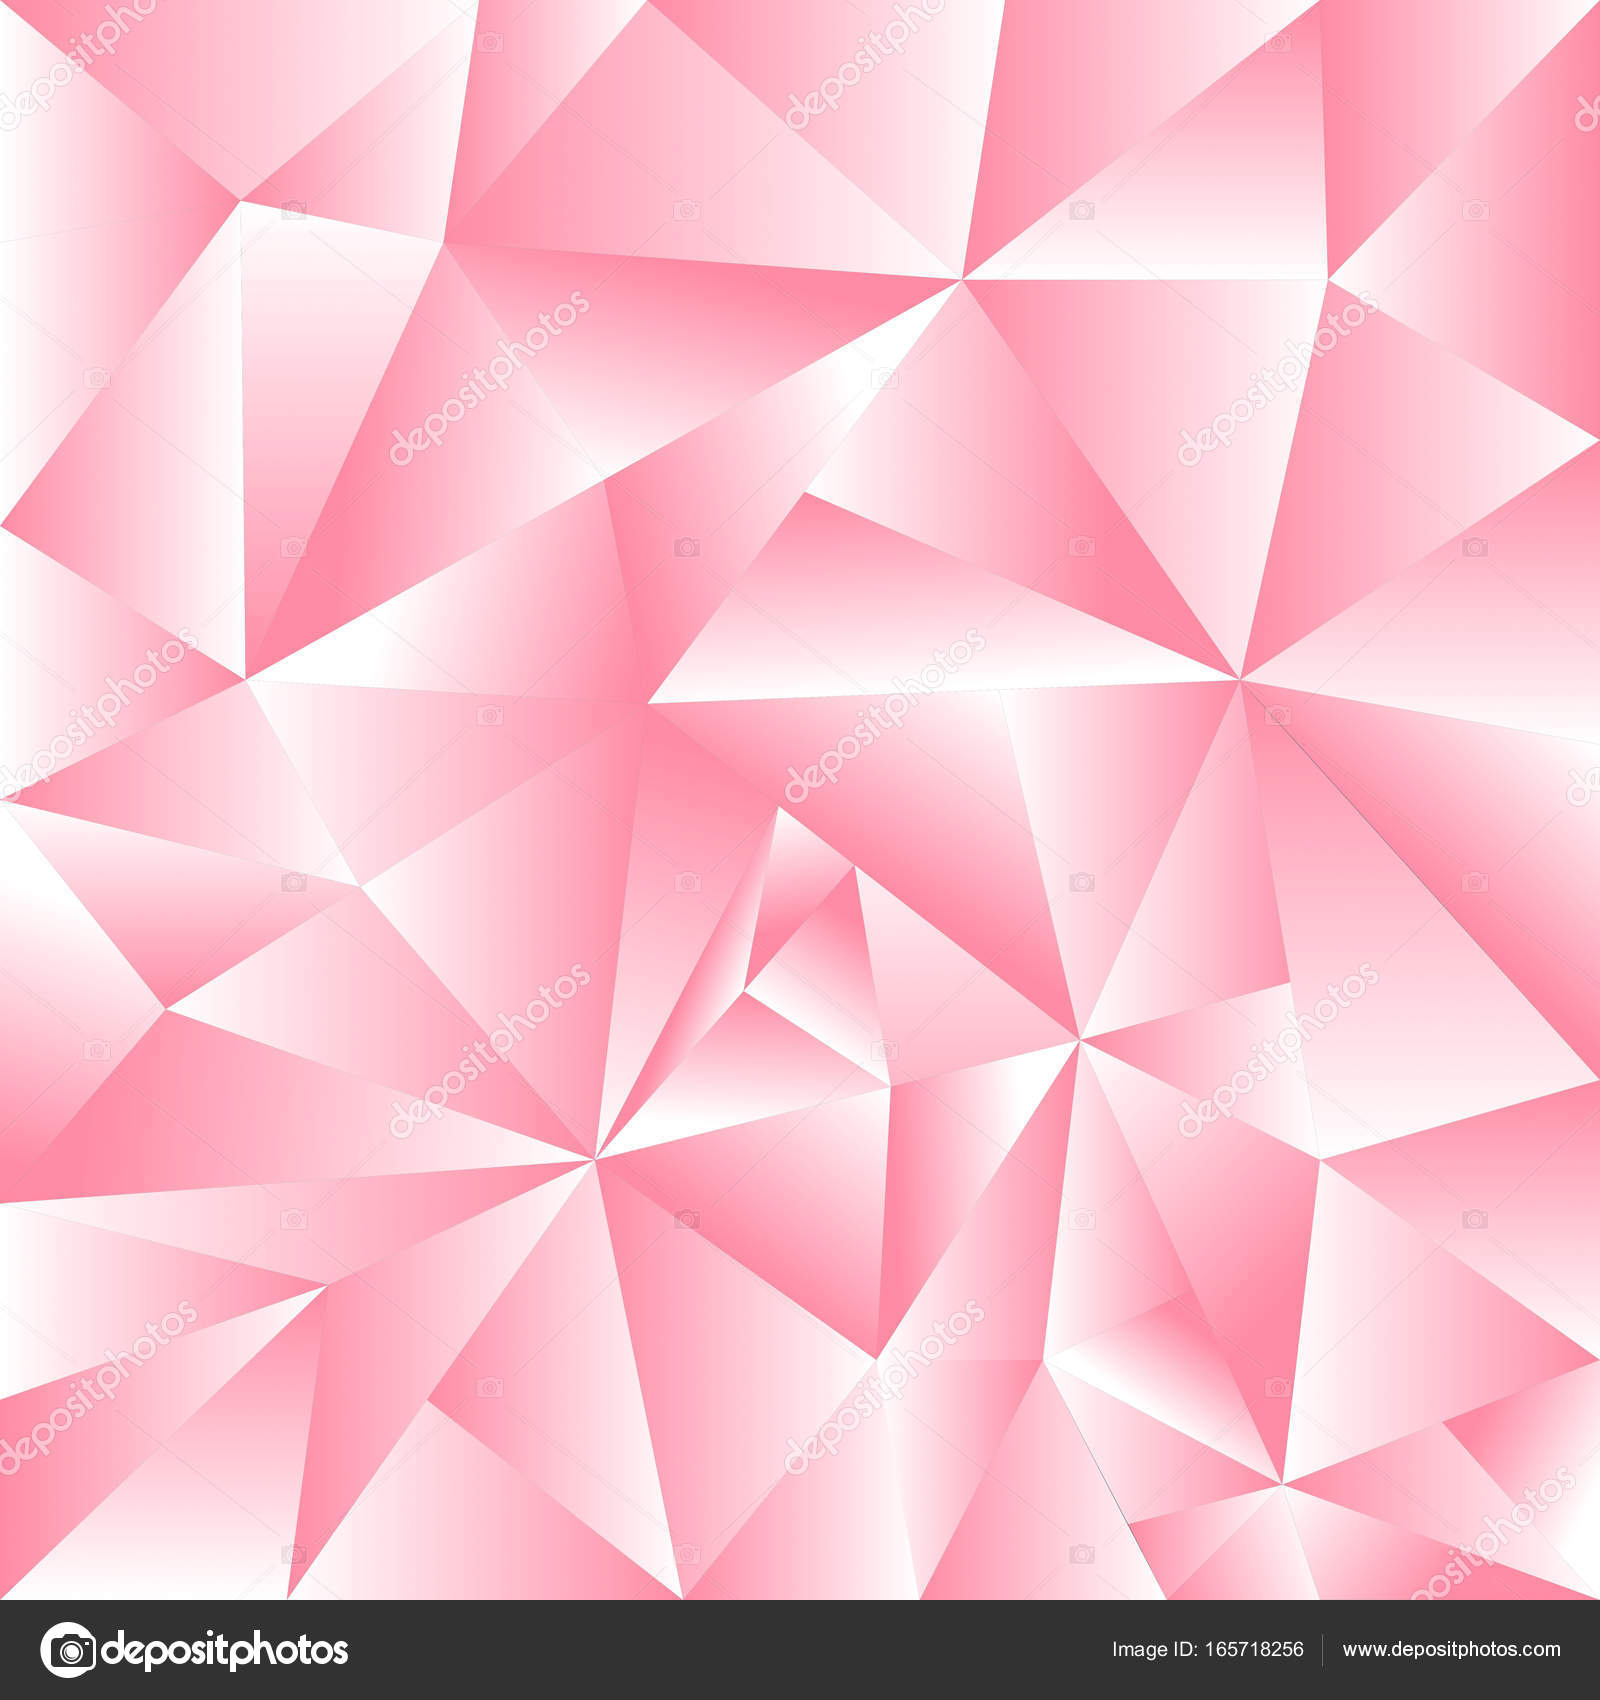 foto de Uso de triângulo rosa abstrato como plano de fundo Stock Photo © eaglesky #165718256